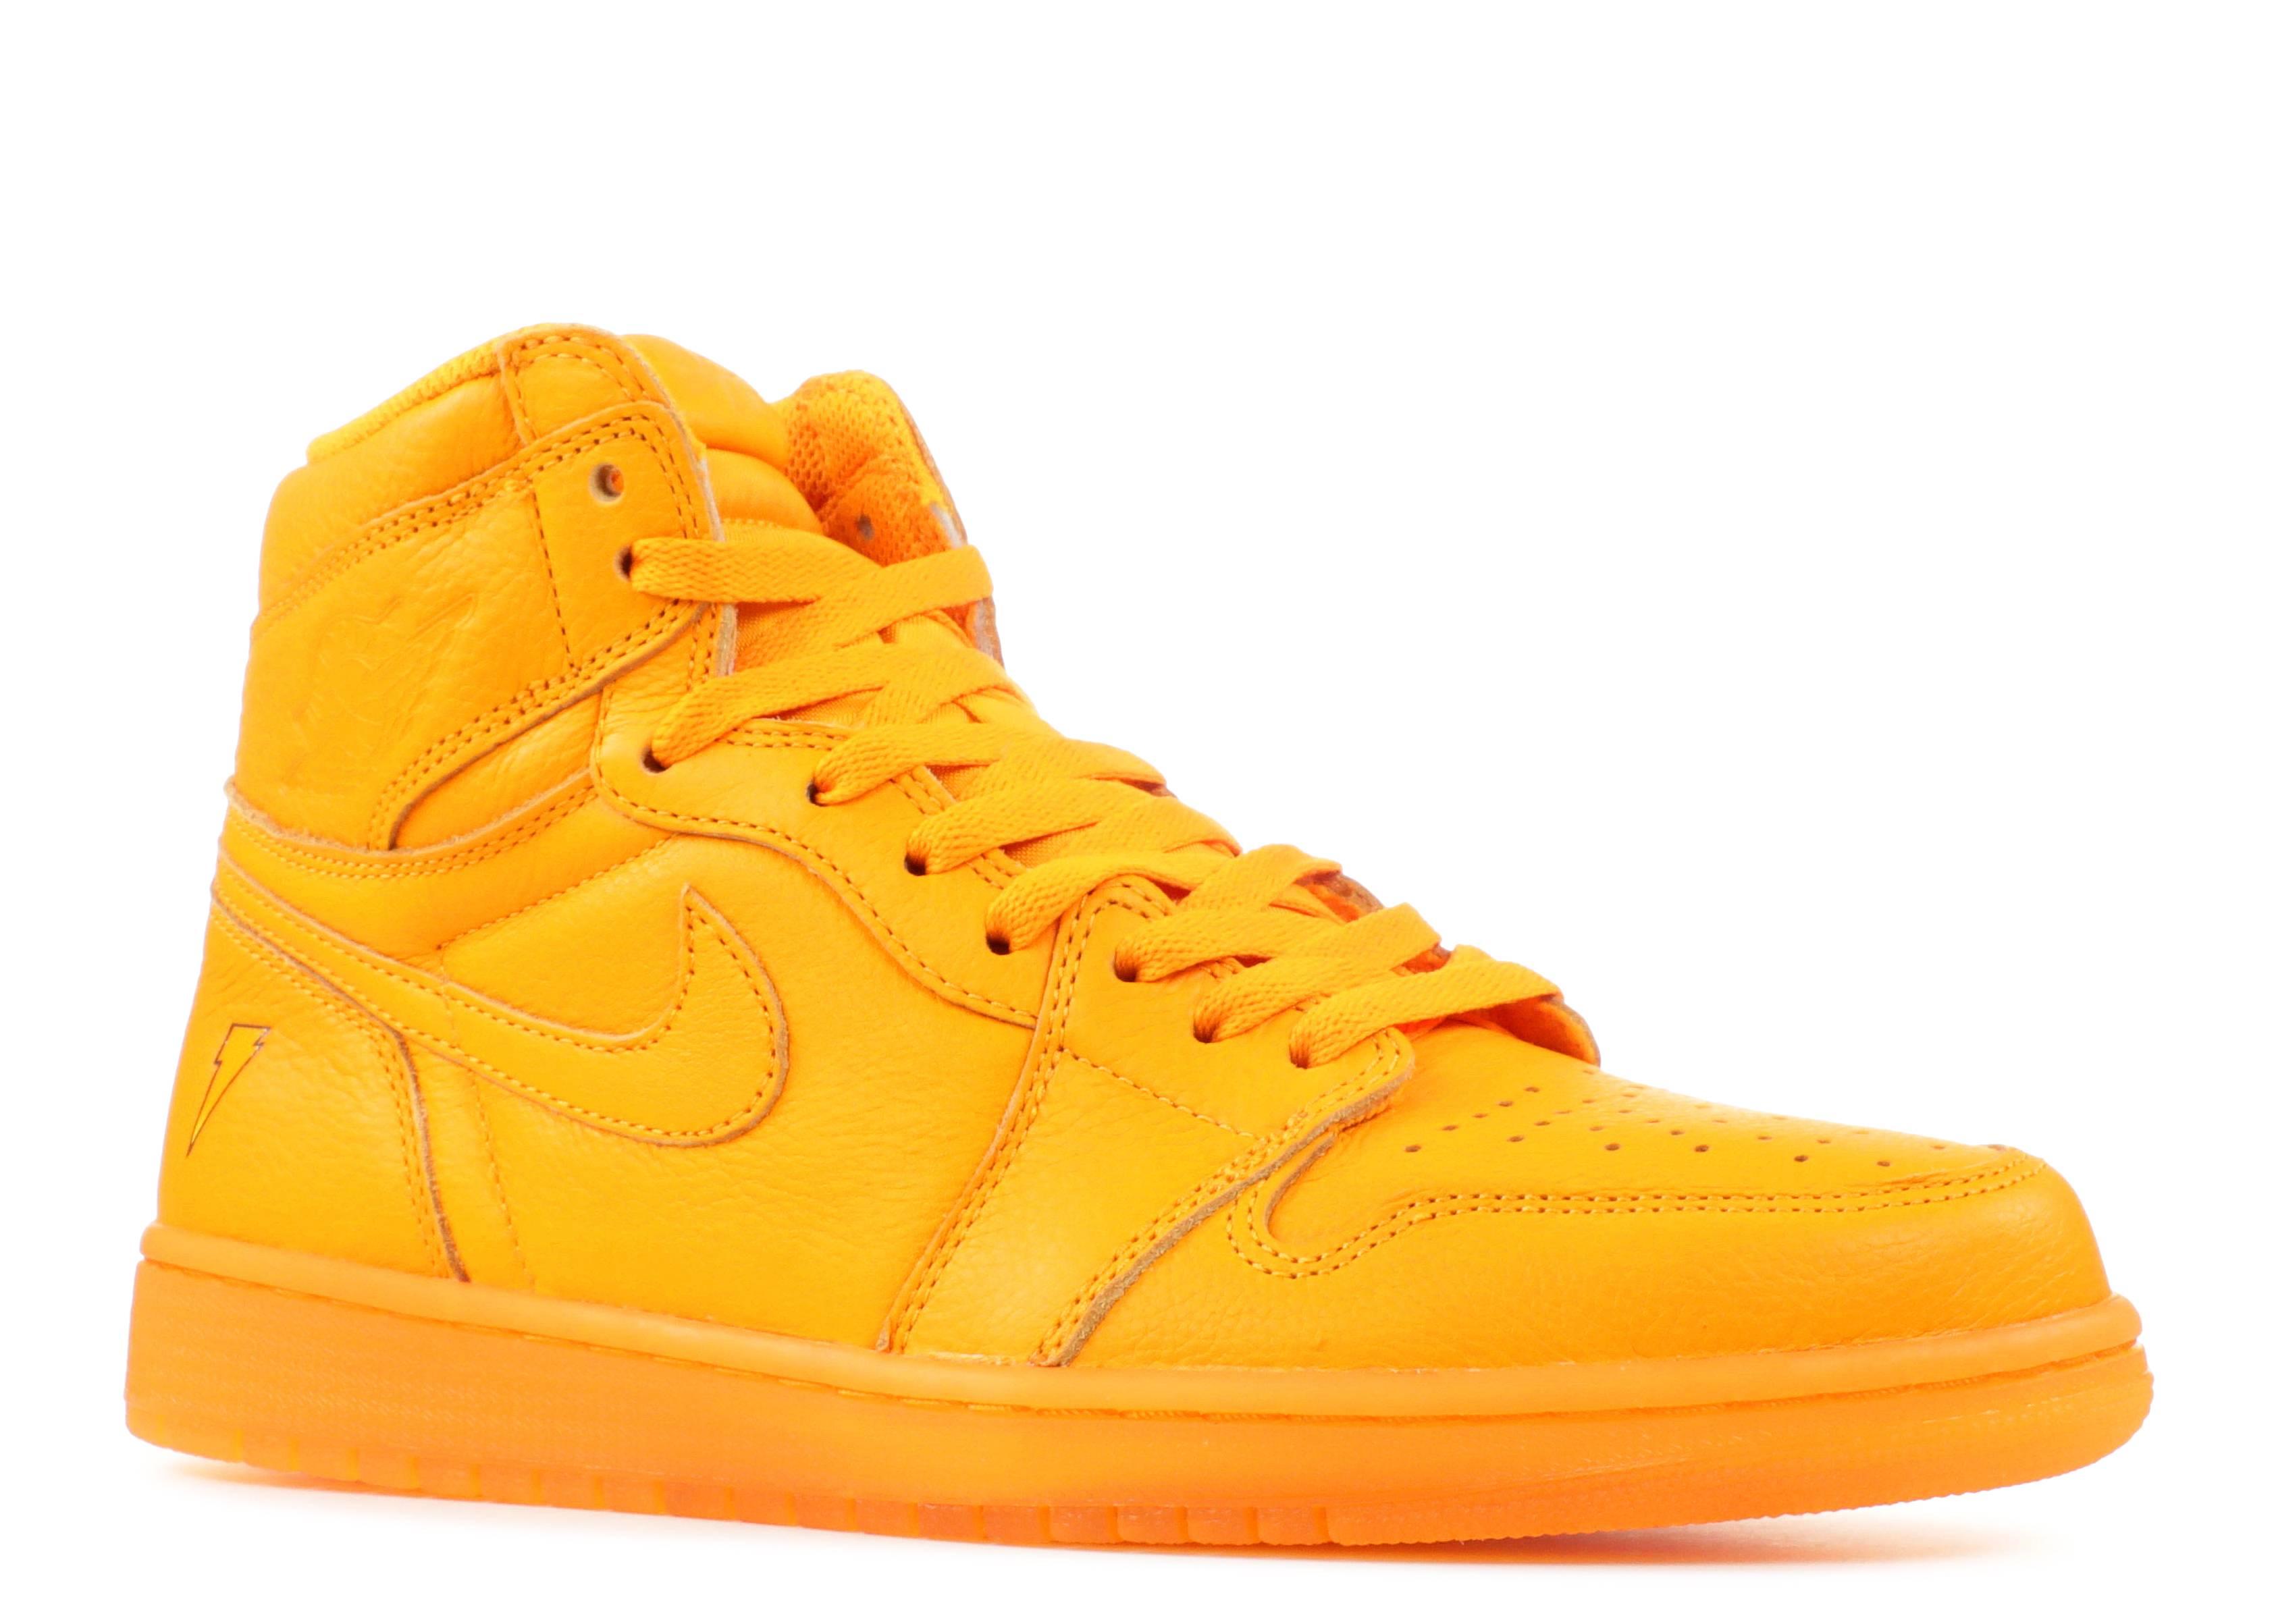 dac2805086ae Jordan 1 Retro High Gatorade Orange Peel - 1